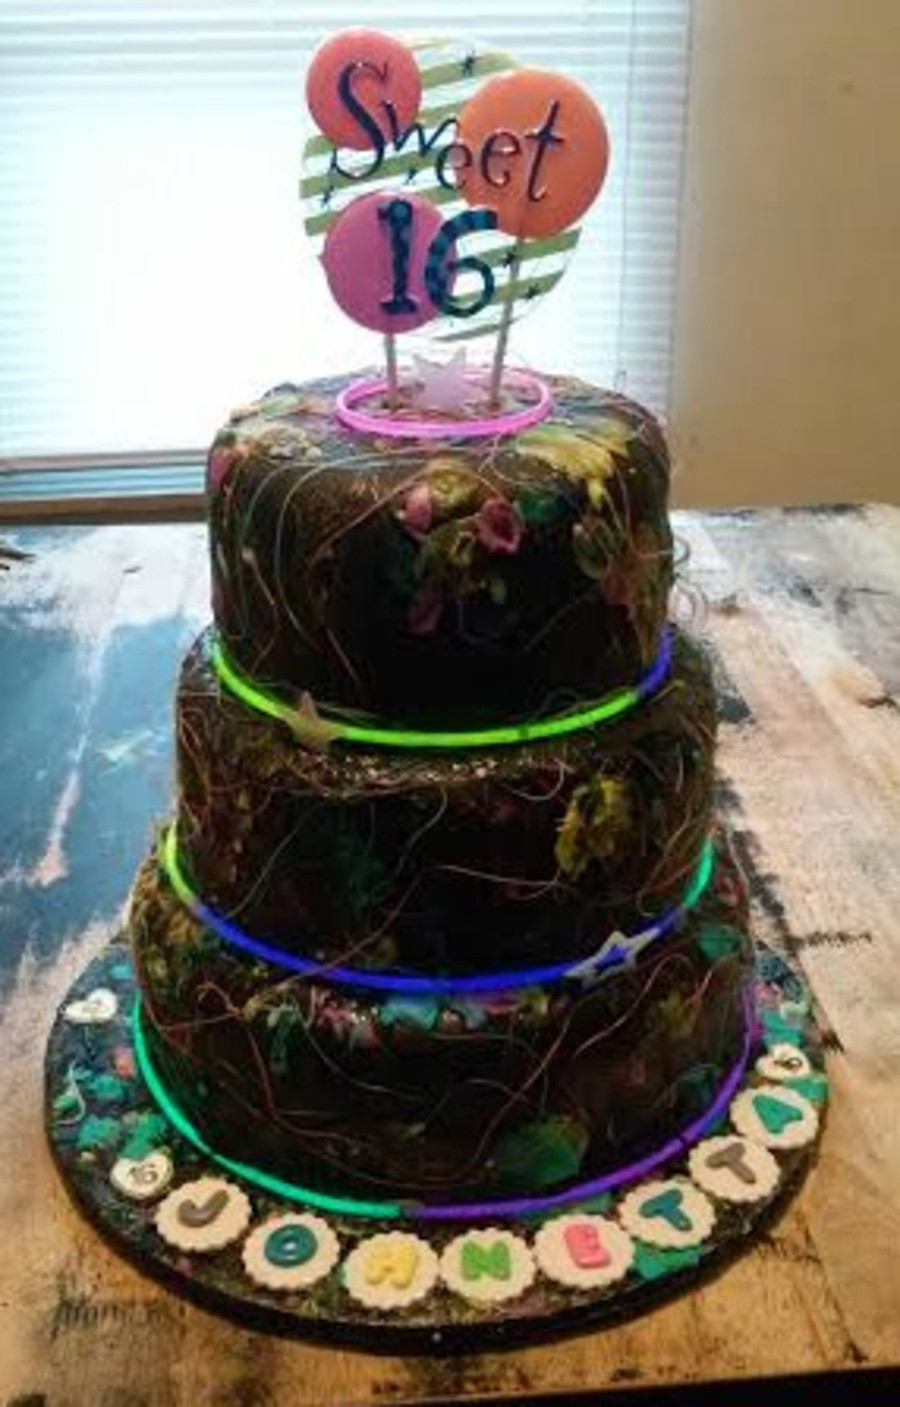 Glow In The Dark Birthday Cake  3 Tier Glow In The Dark Sweet 16 Birthday Cake